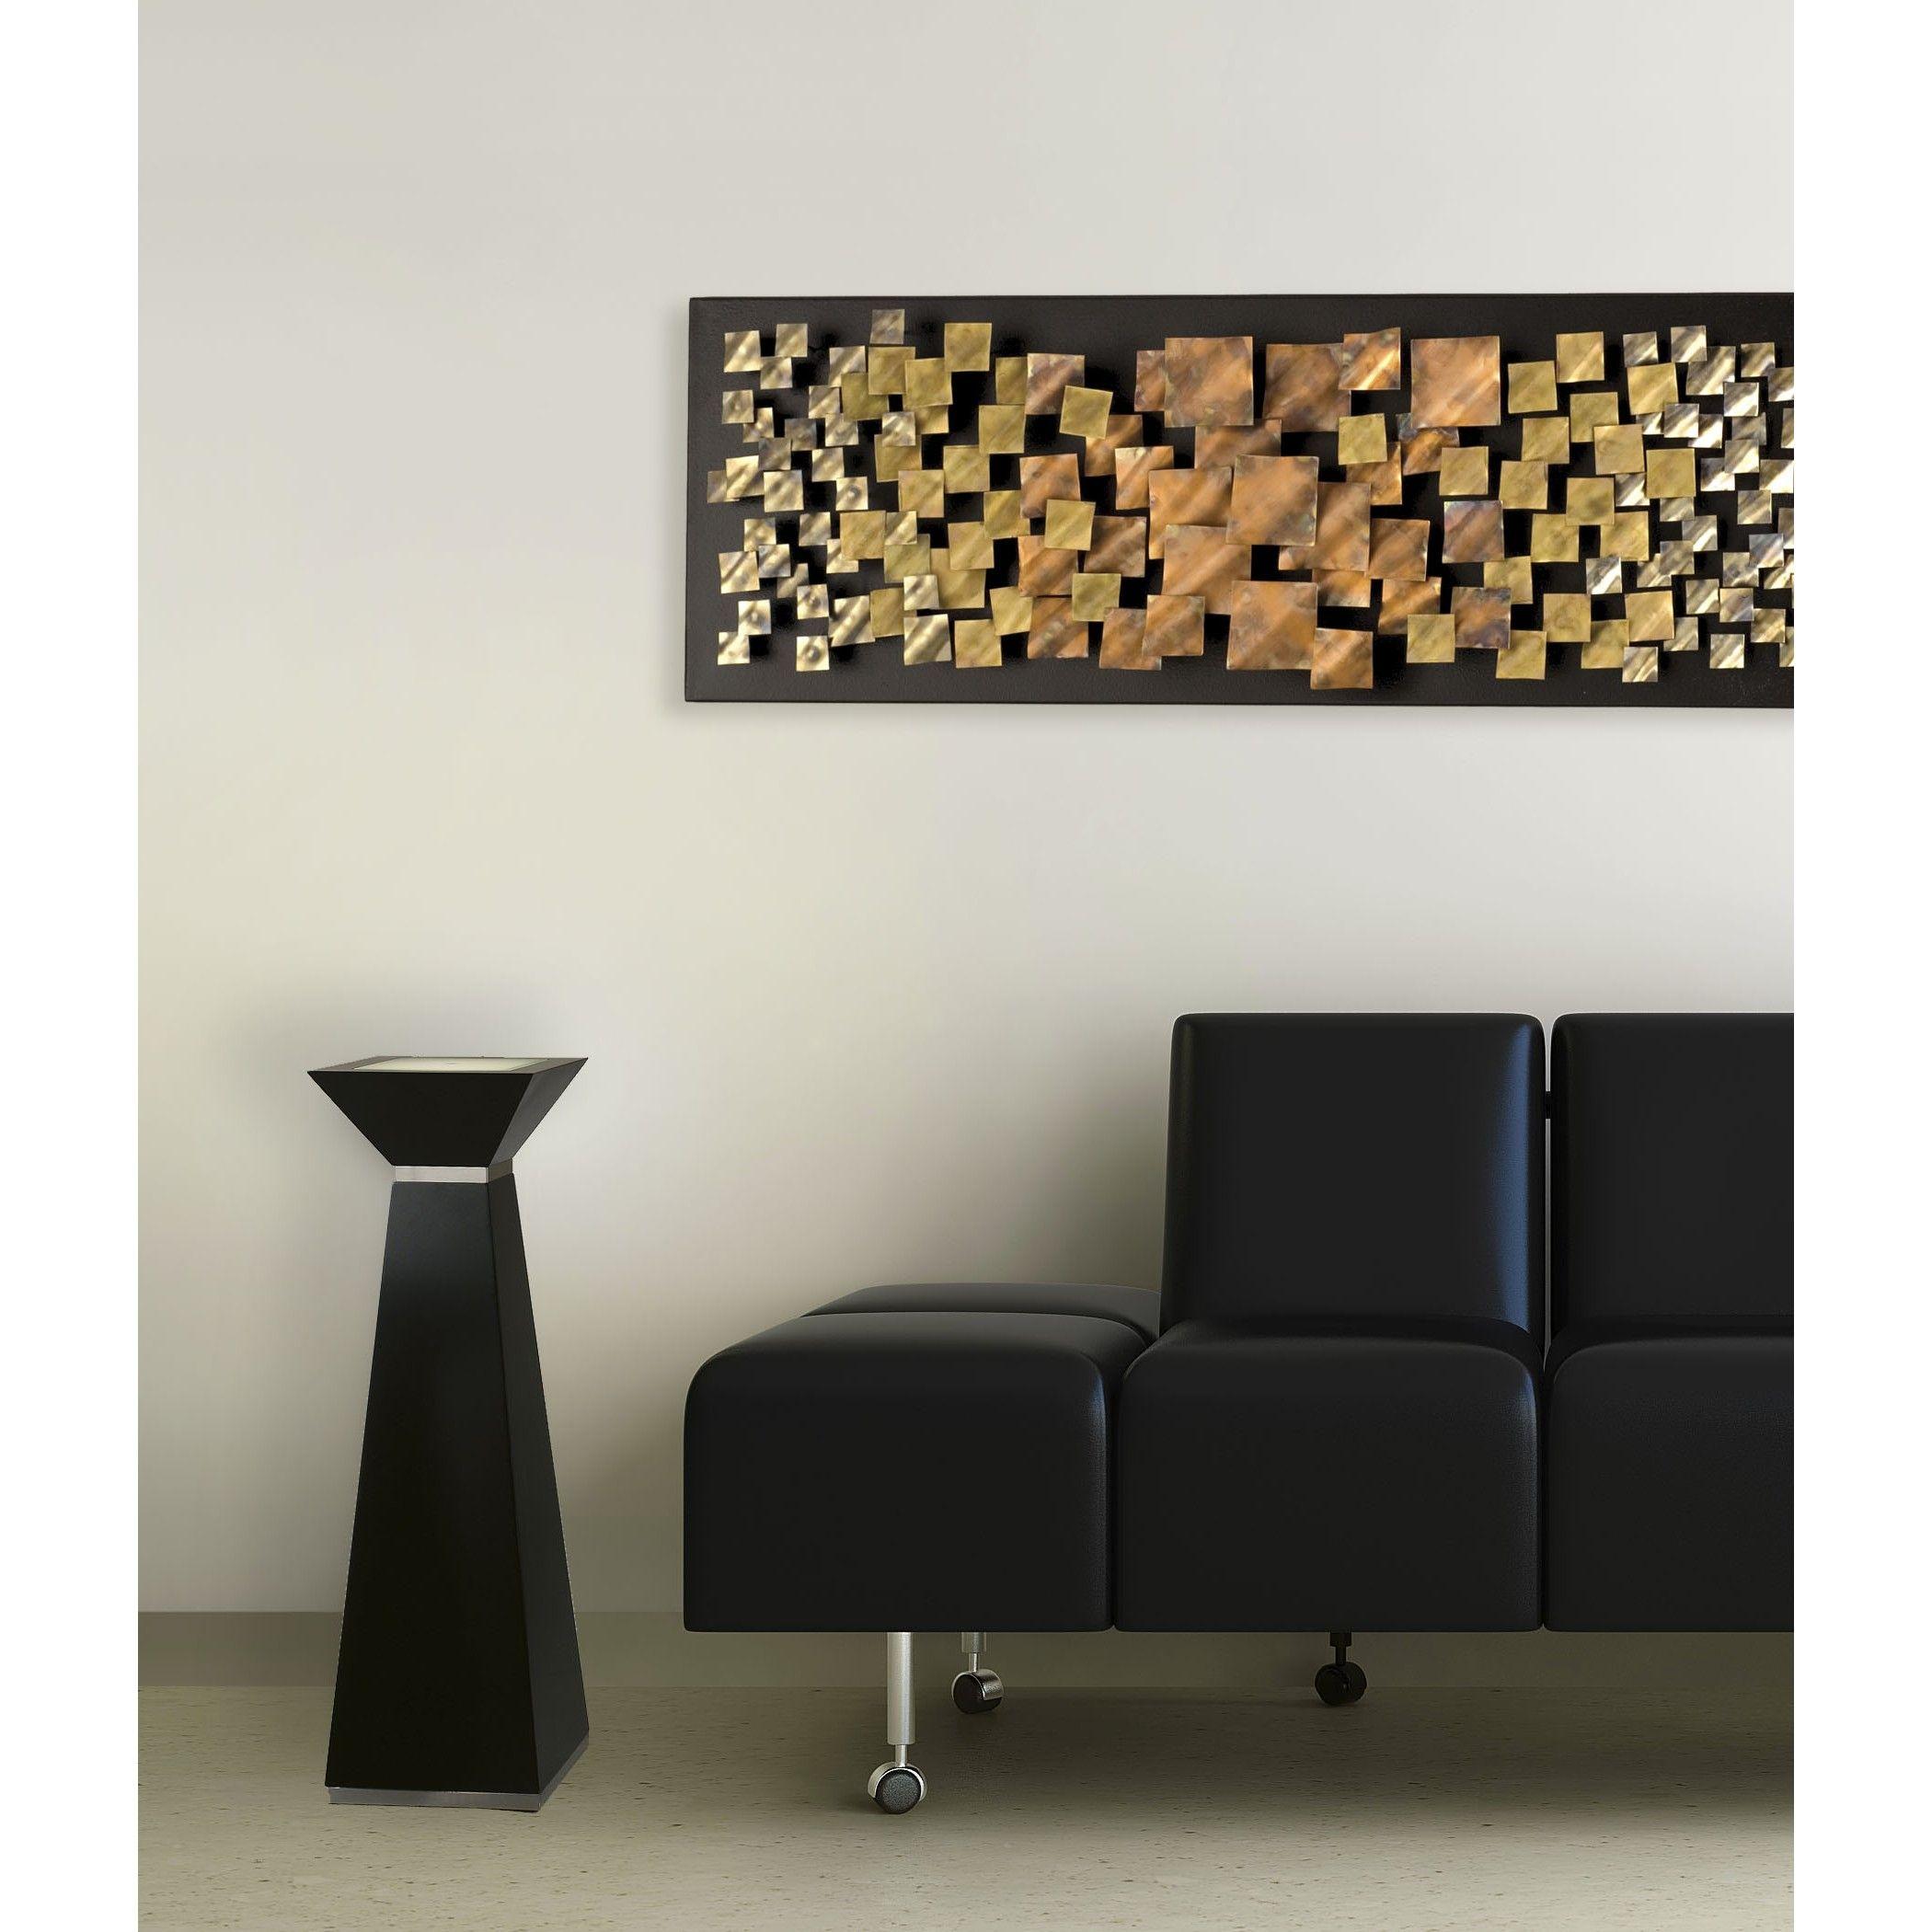 Wall Sculptures Studiolx Mosaic Art By Nova